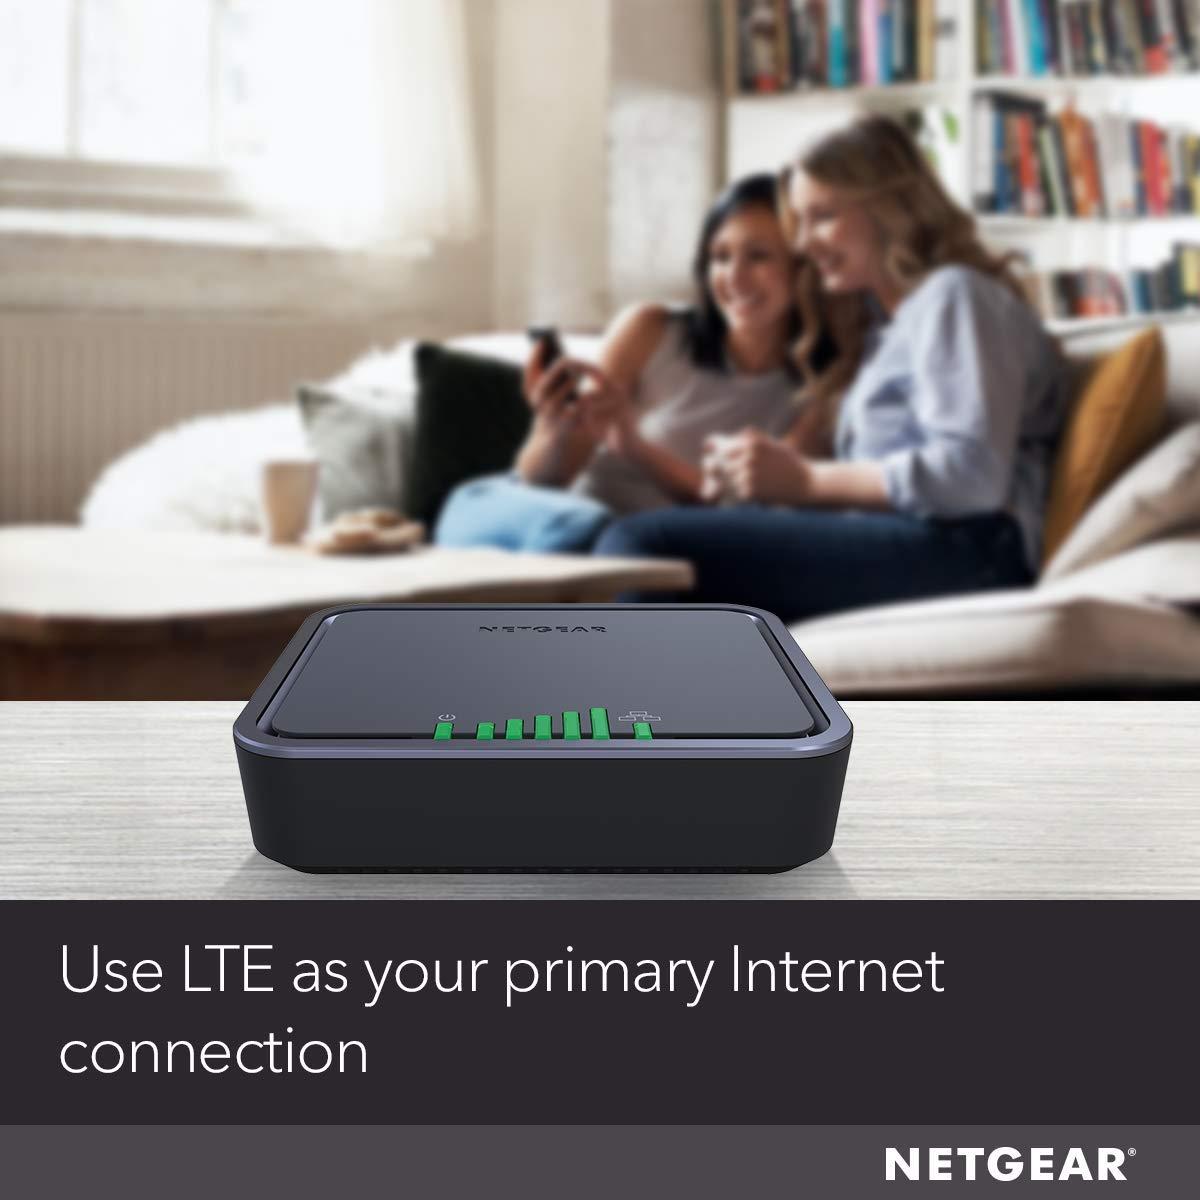 NETGEAR 4G LTE Broadband Modem  Use LTE as primary Internet Connection LB1120